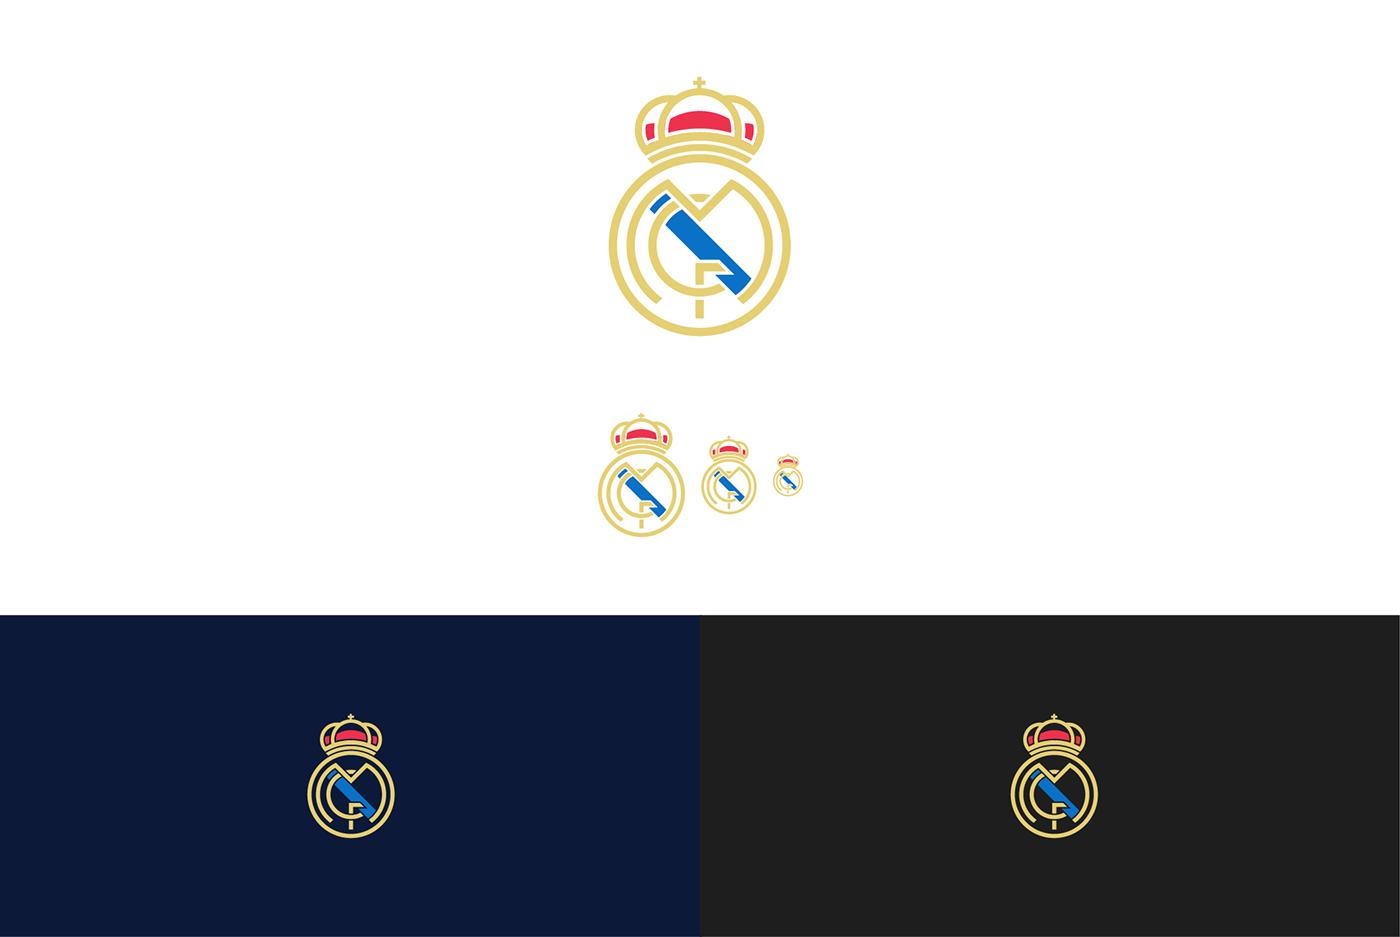 Real Madrid,football,Futbol,soccer,gold,redesign,Webdesign,logo,Web,spain